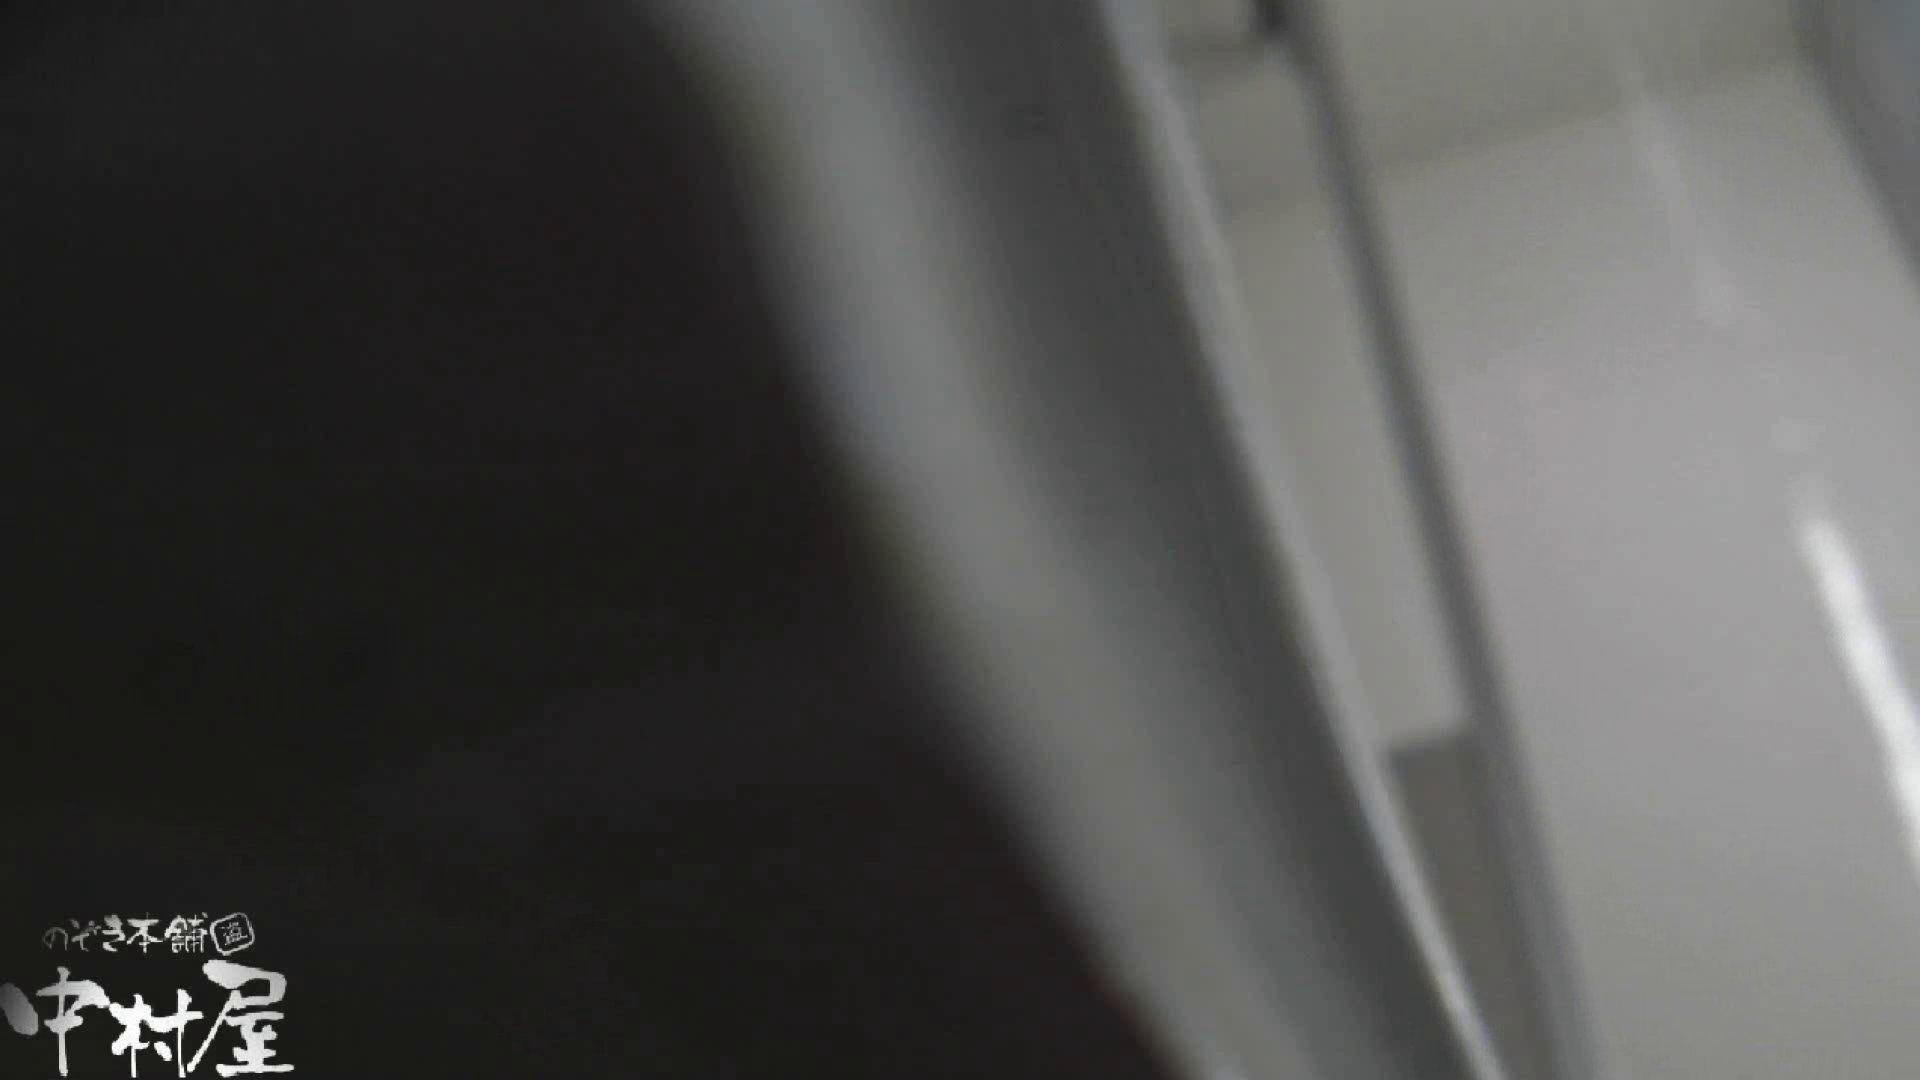 vol.27 命がけ潜伏洗面所! 多い日も安心じゃない件 潜入 おまんこ無修正動画無料 91PIX 62